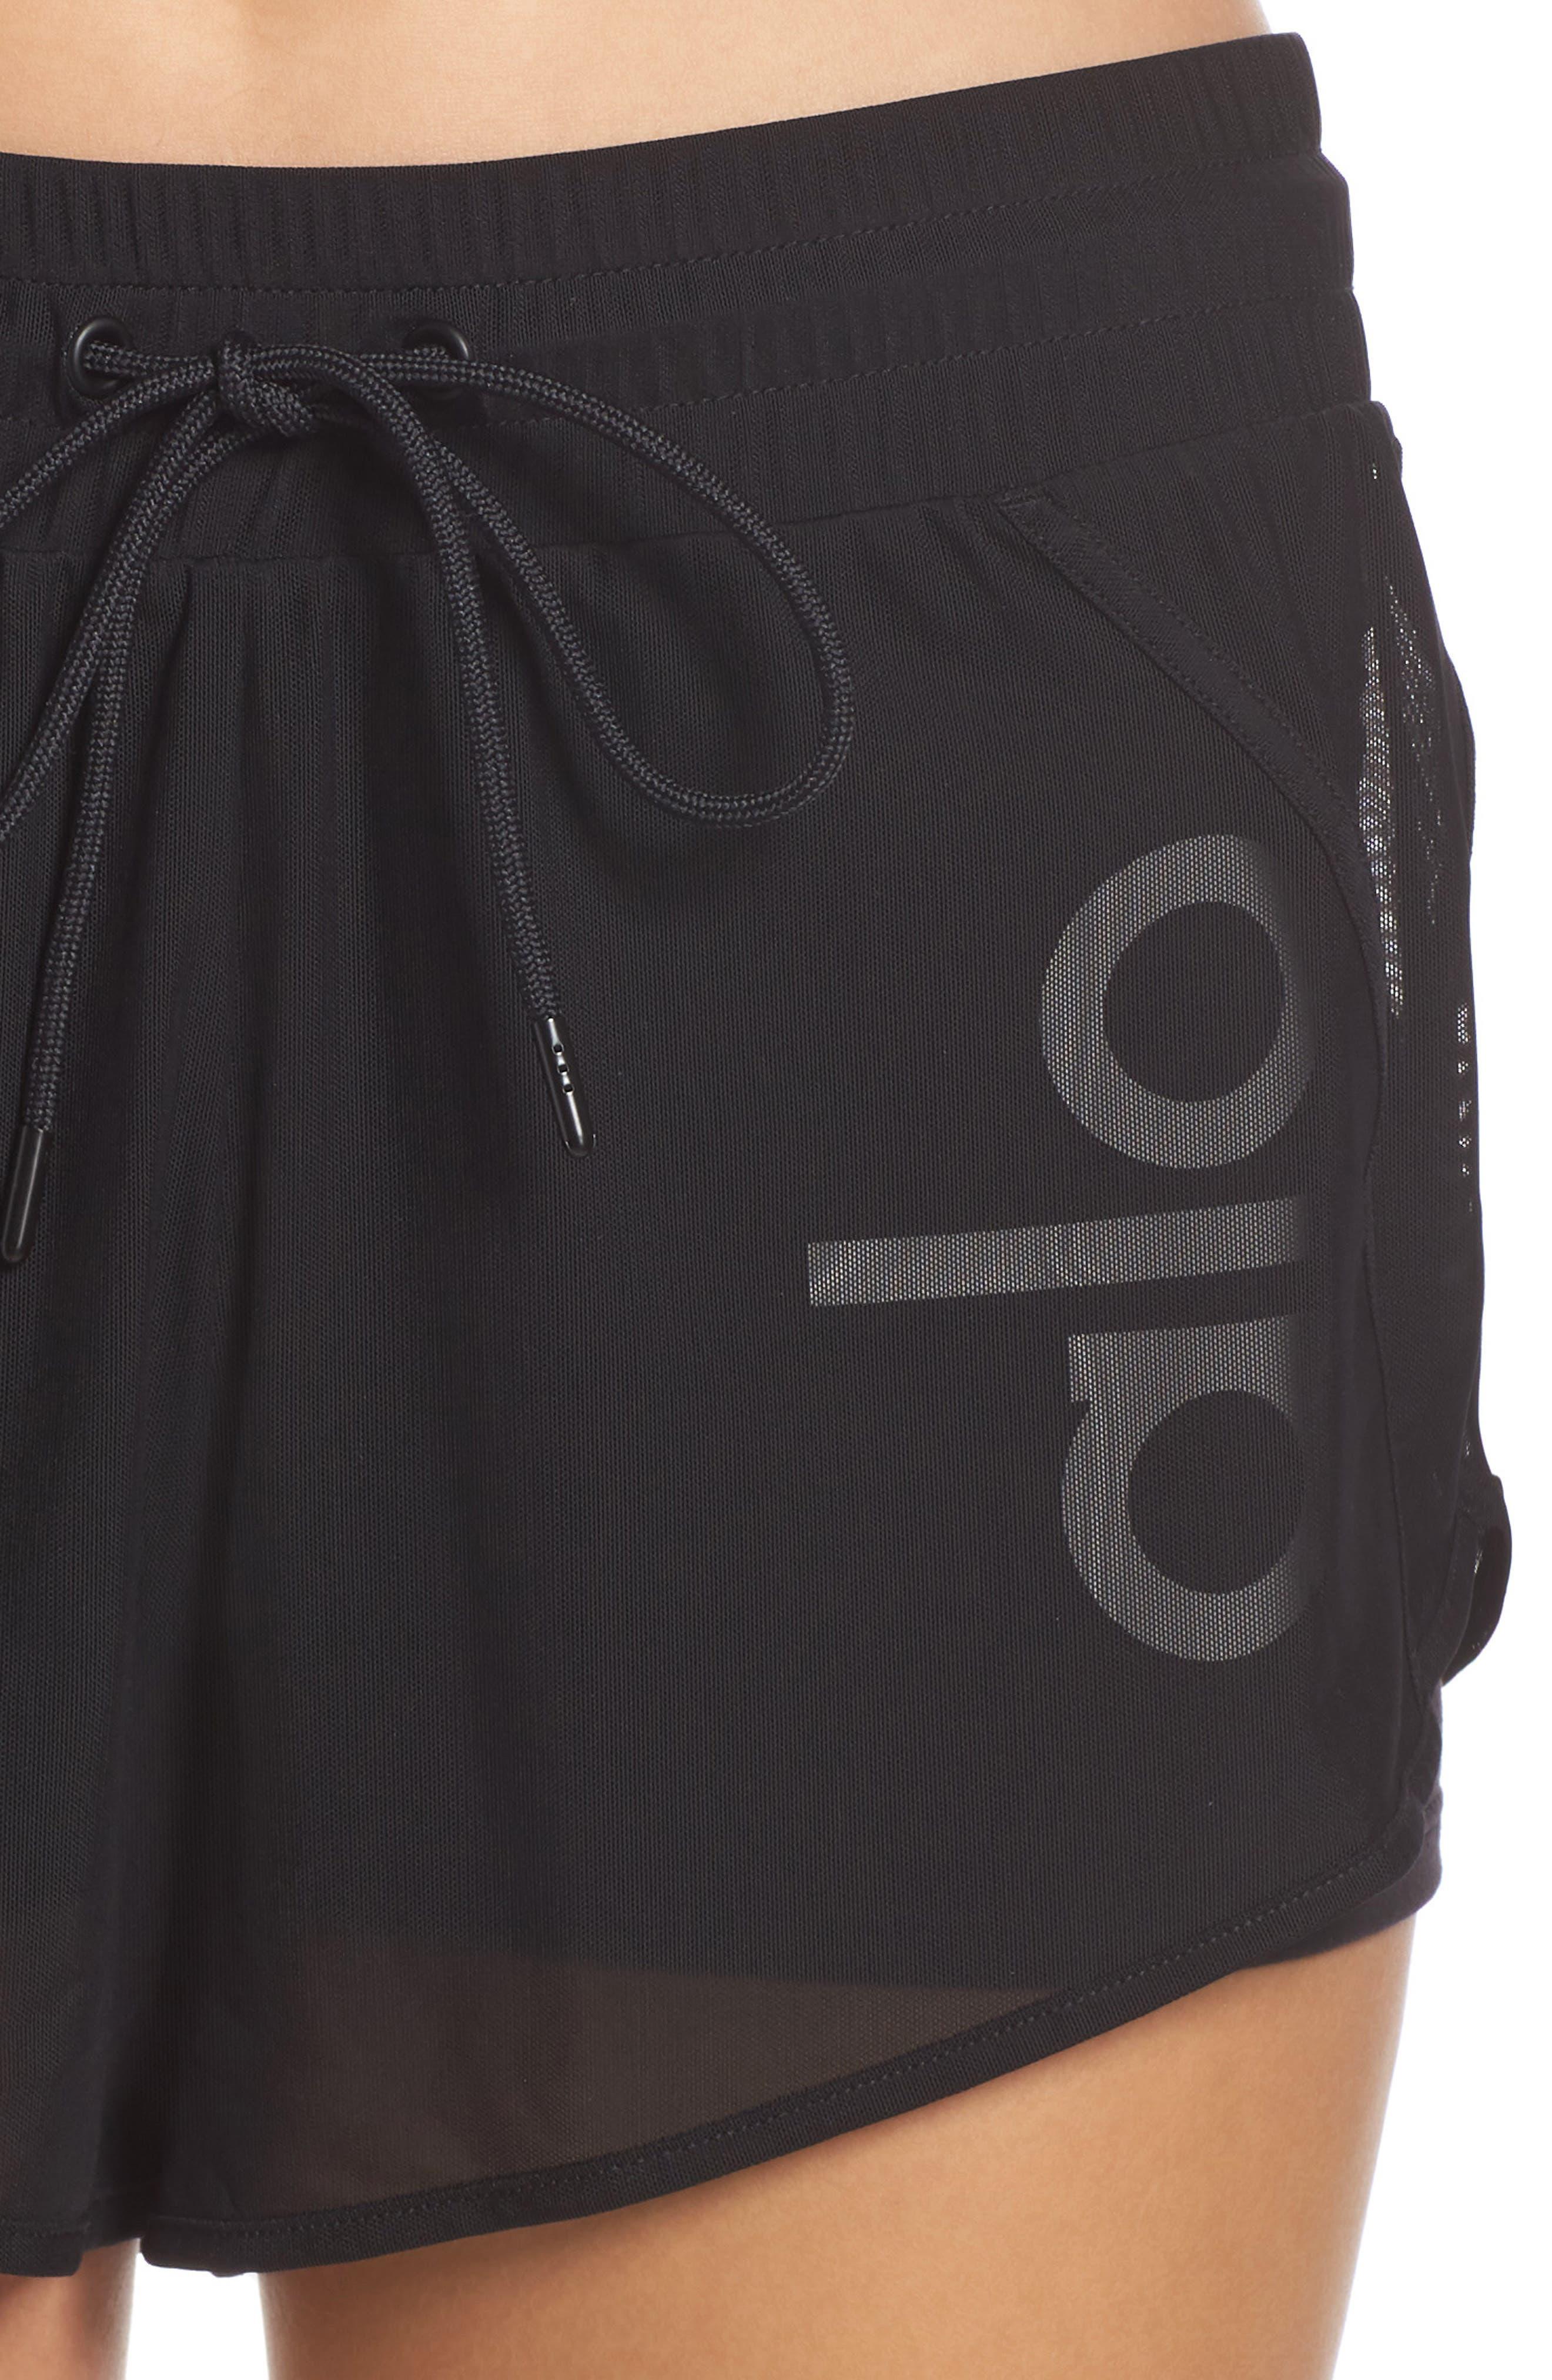 Ambience Shorts,                             Alternate thumbnail 4, color,                             BLACK/ BLACK/ ALO/ WHITE